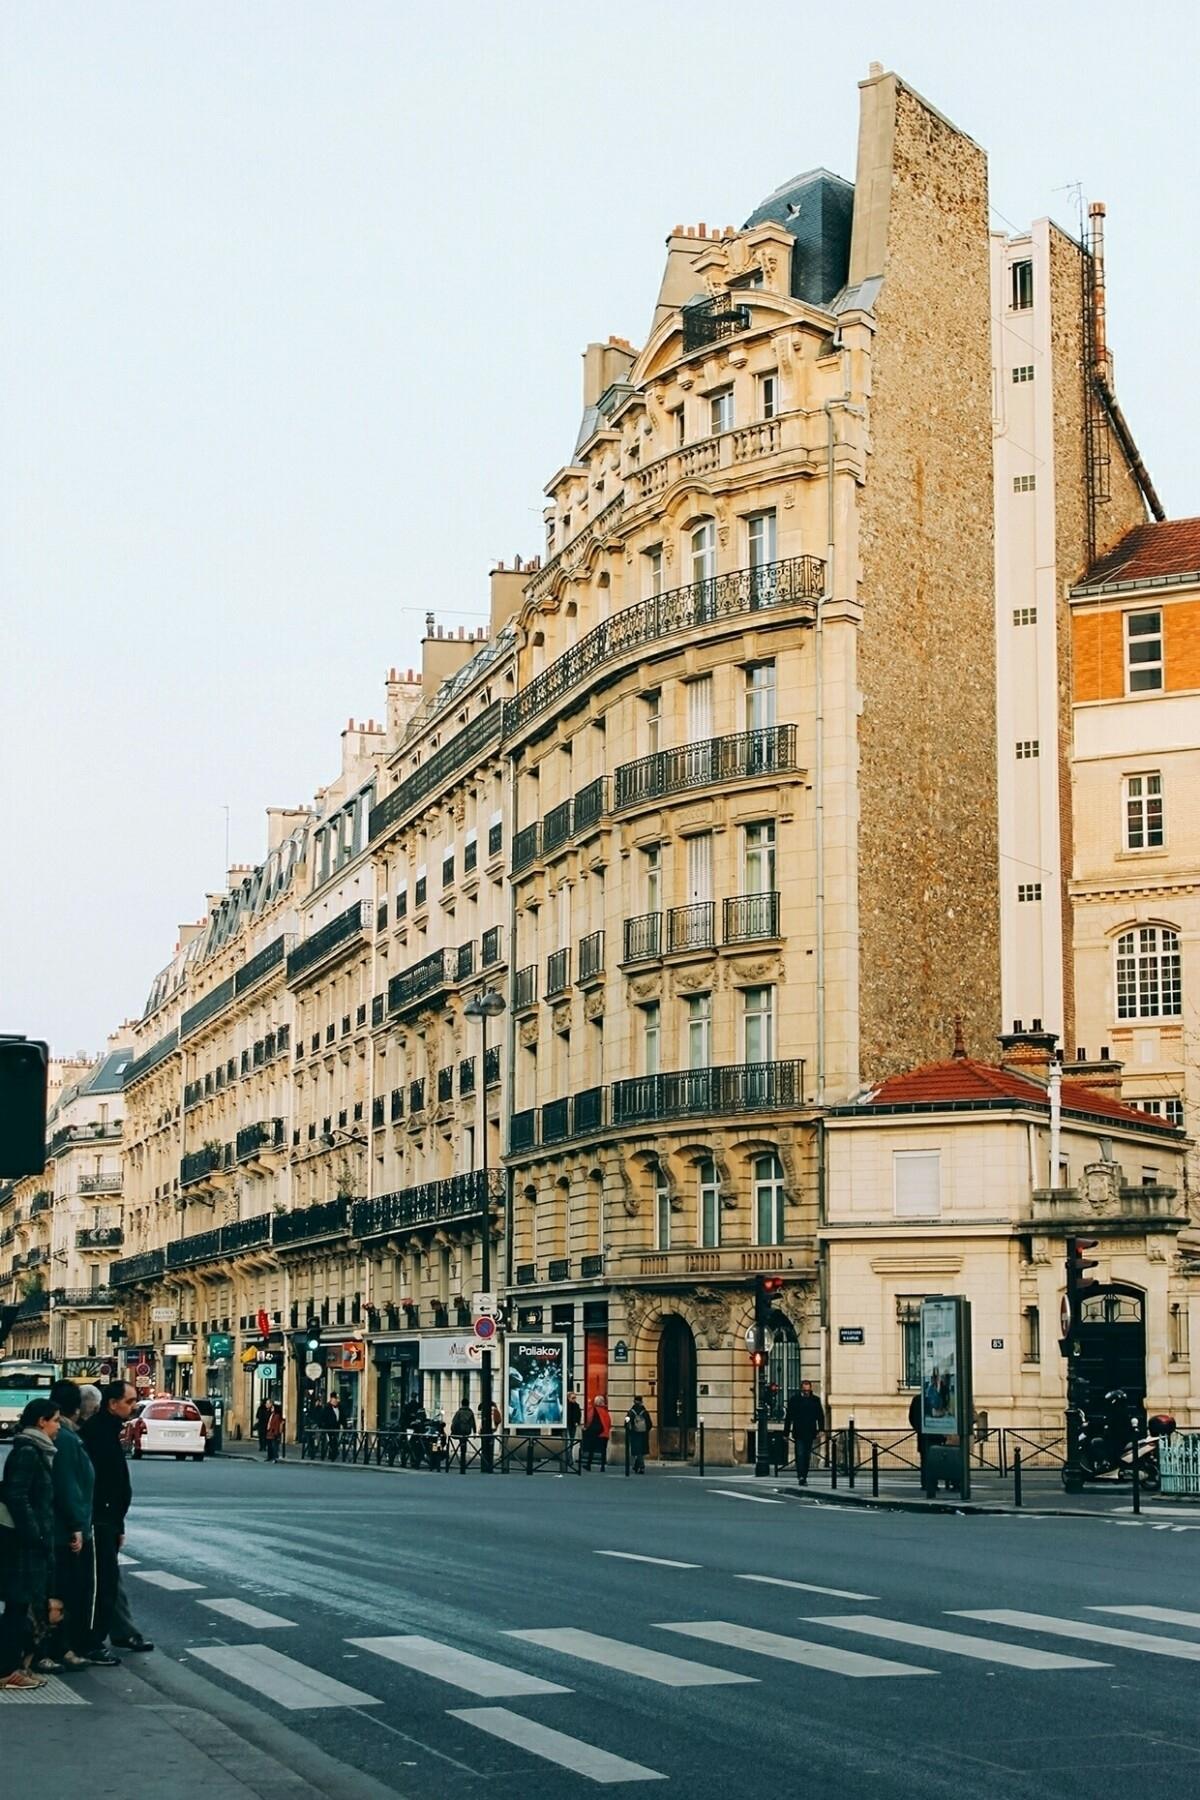 paris, film, filmphotography - marianateixeira | ello